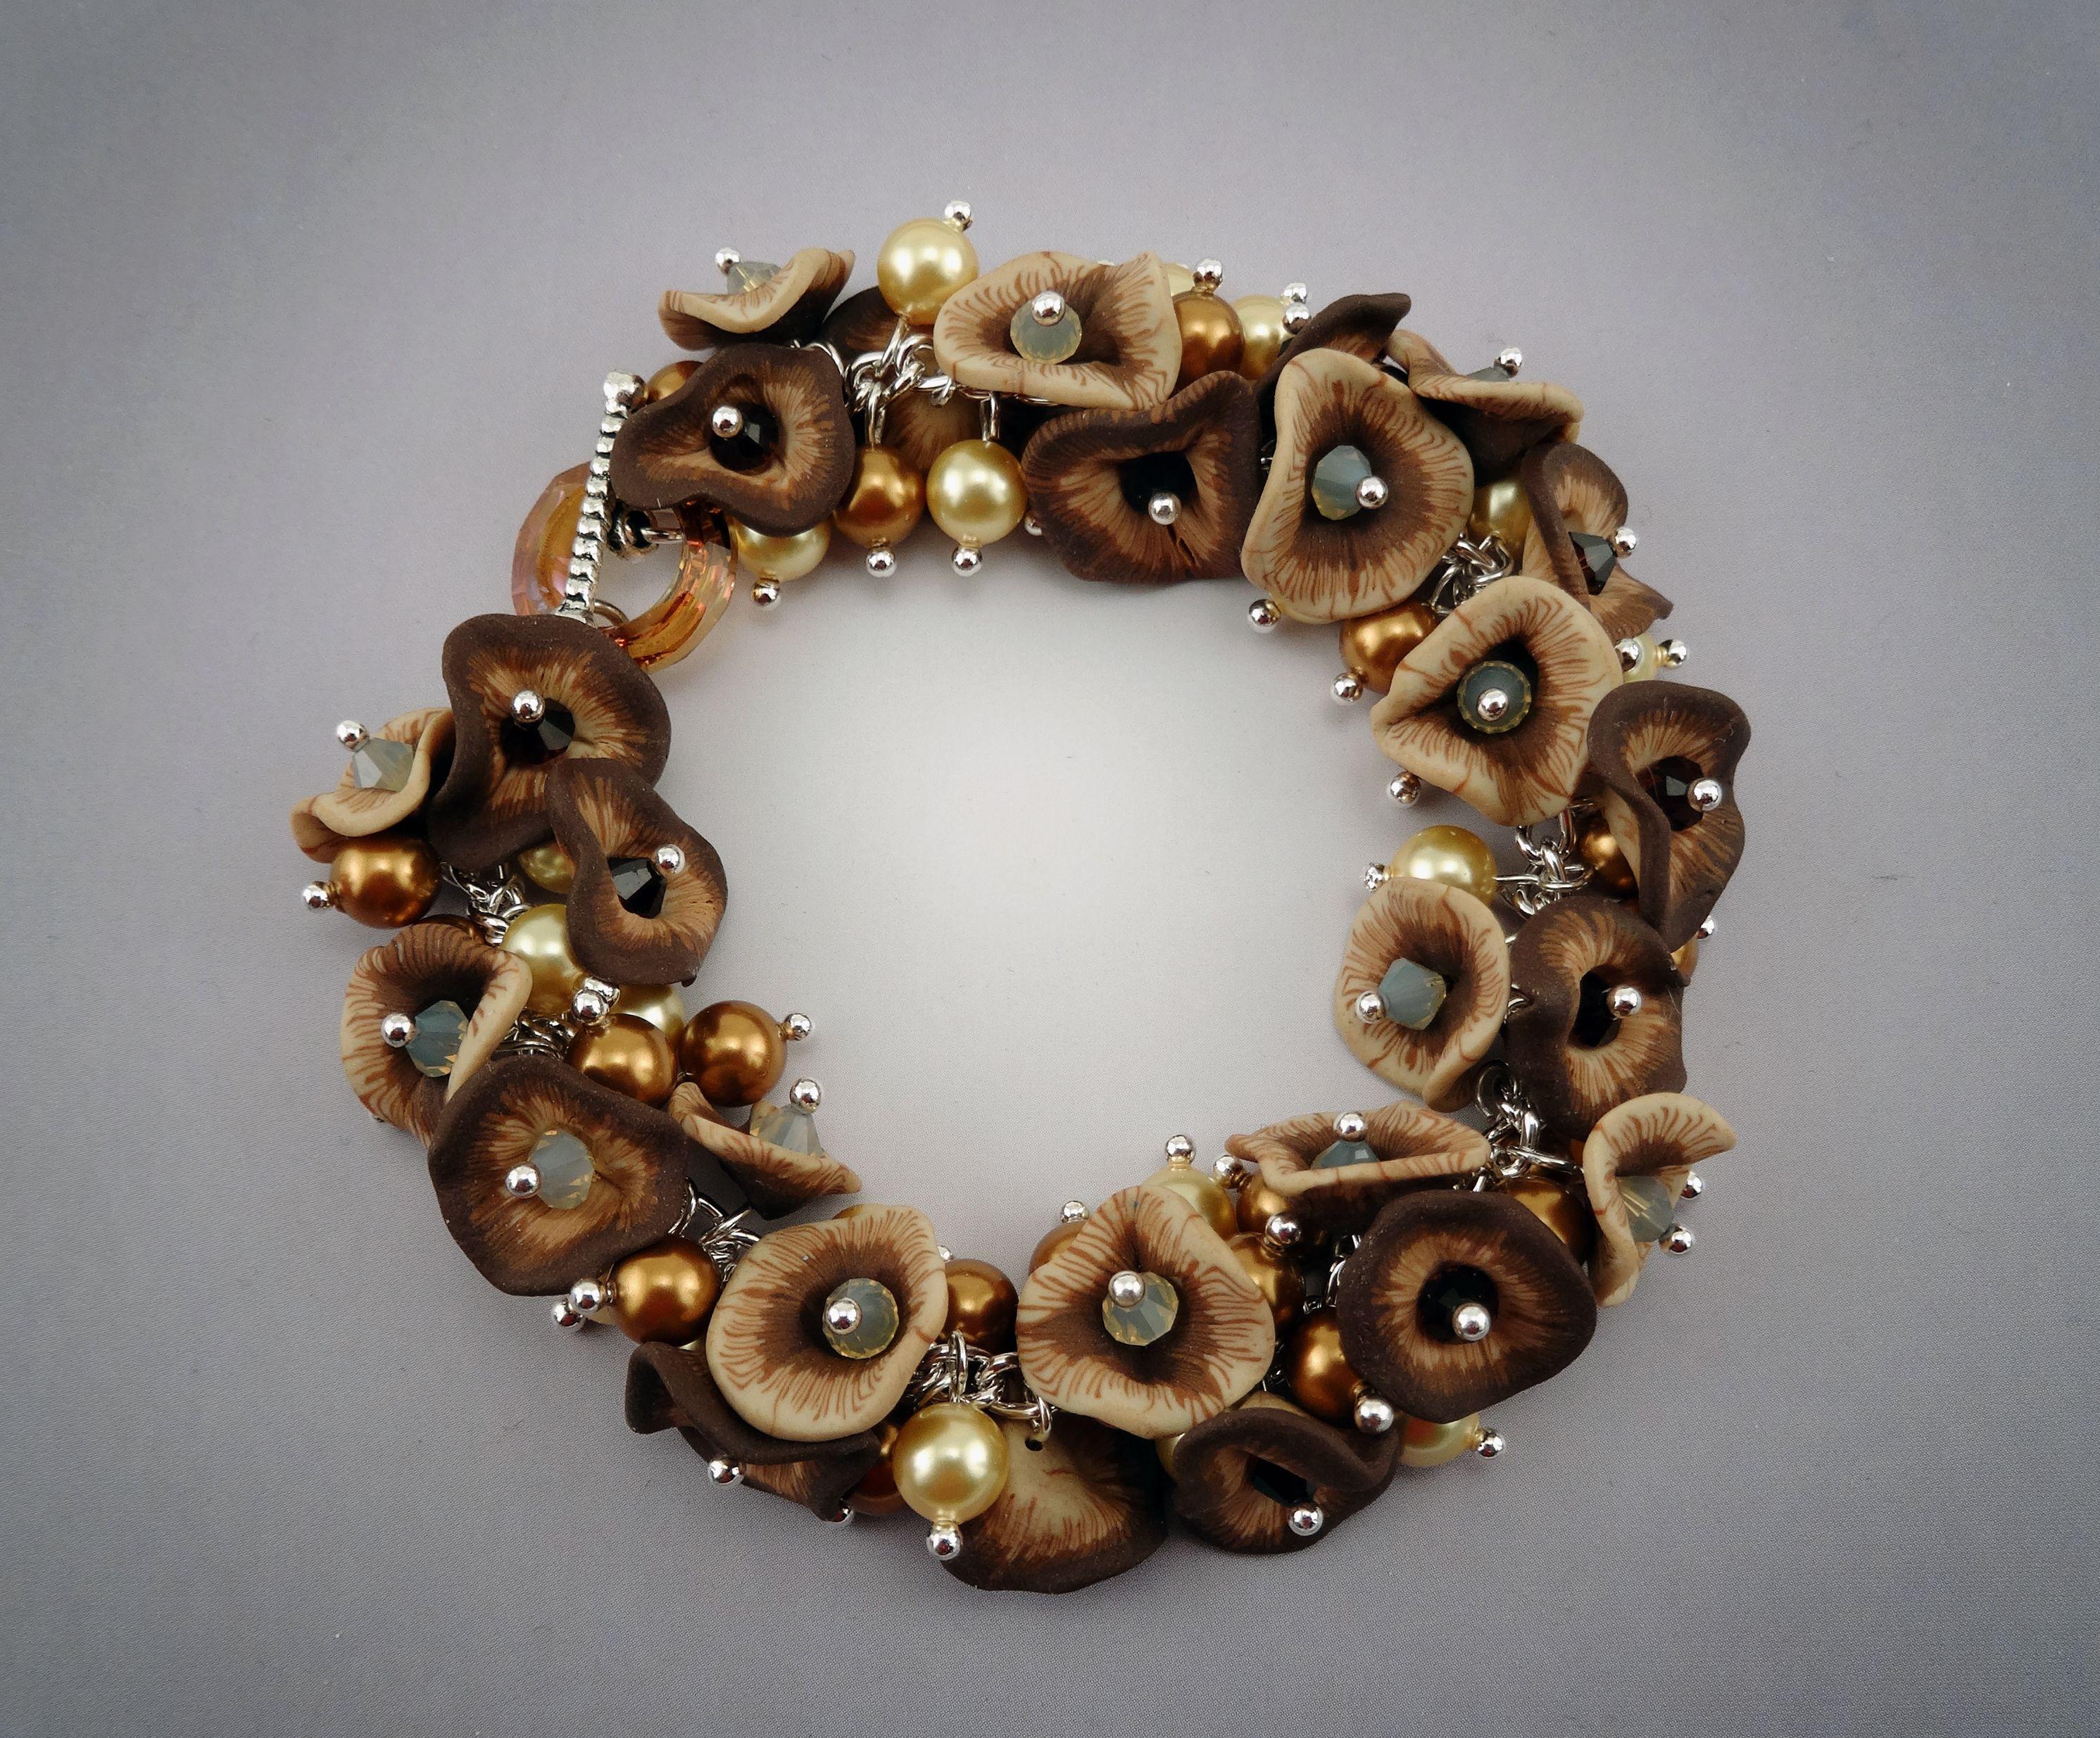 Polymer Clay Crystal Blossom Bracelet (by Lisa Pavelka)